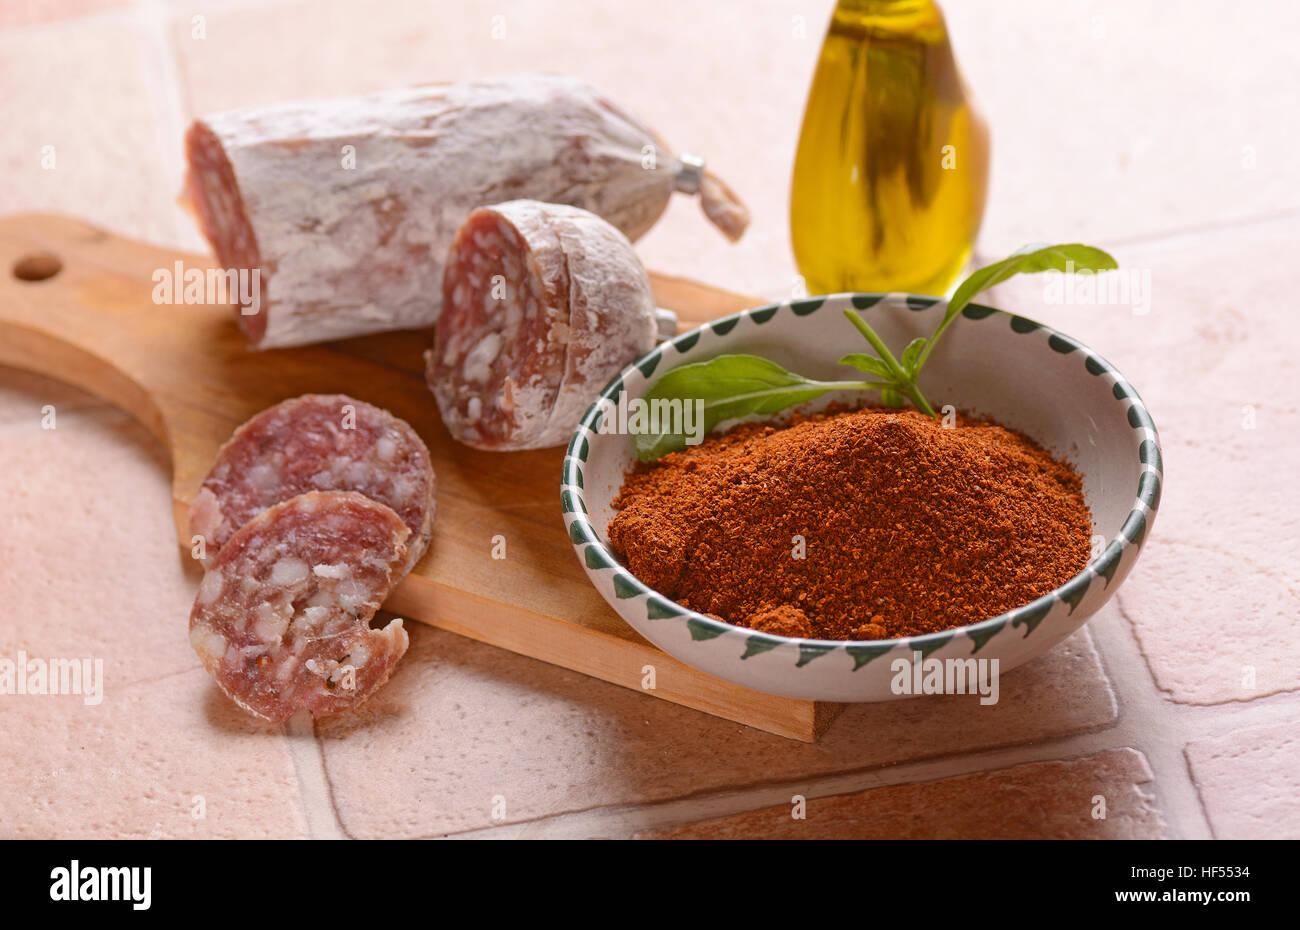 Pure pork salami with chili - traditional Italian food - Stock Image